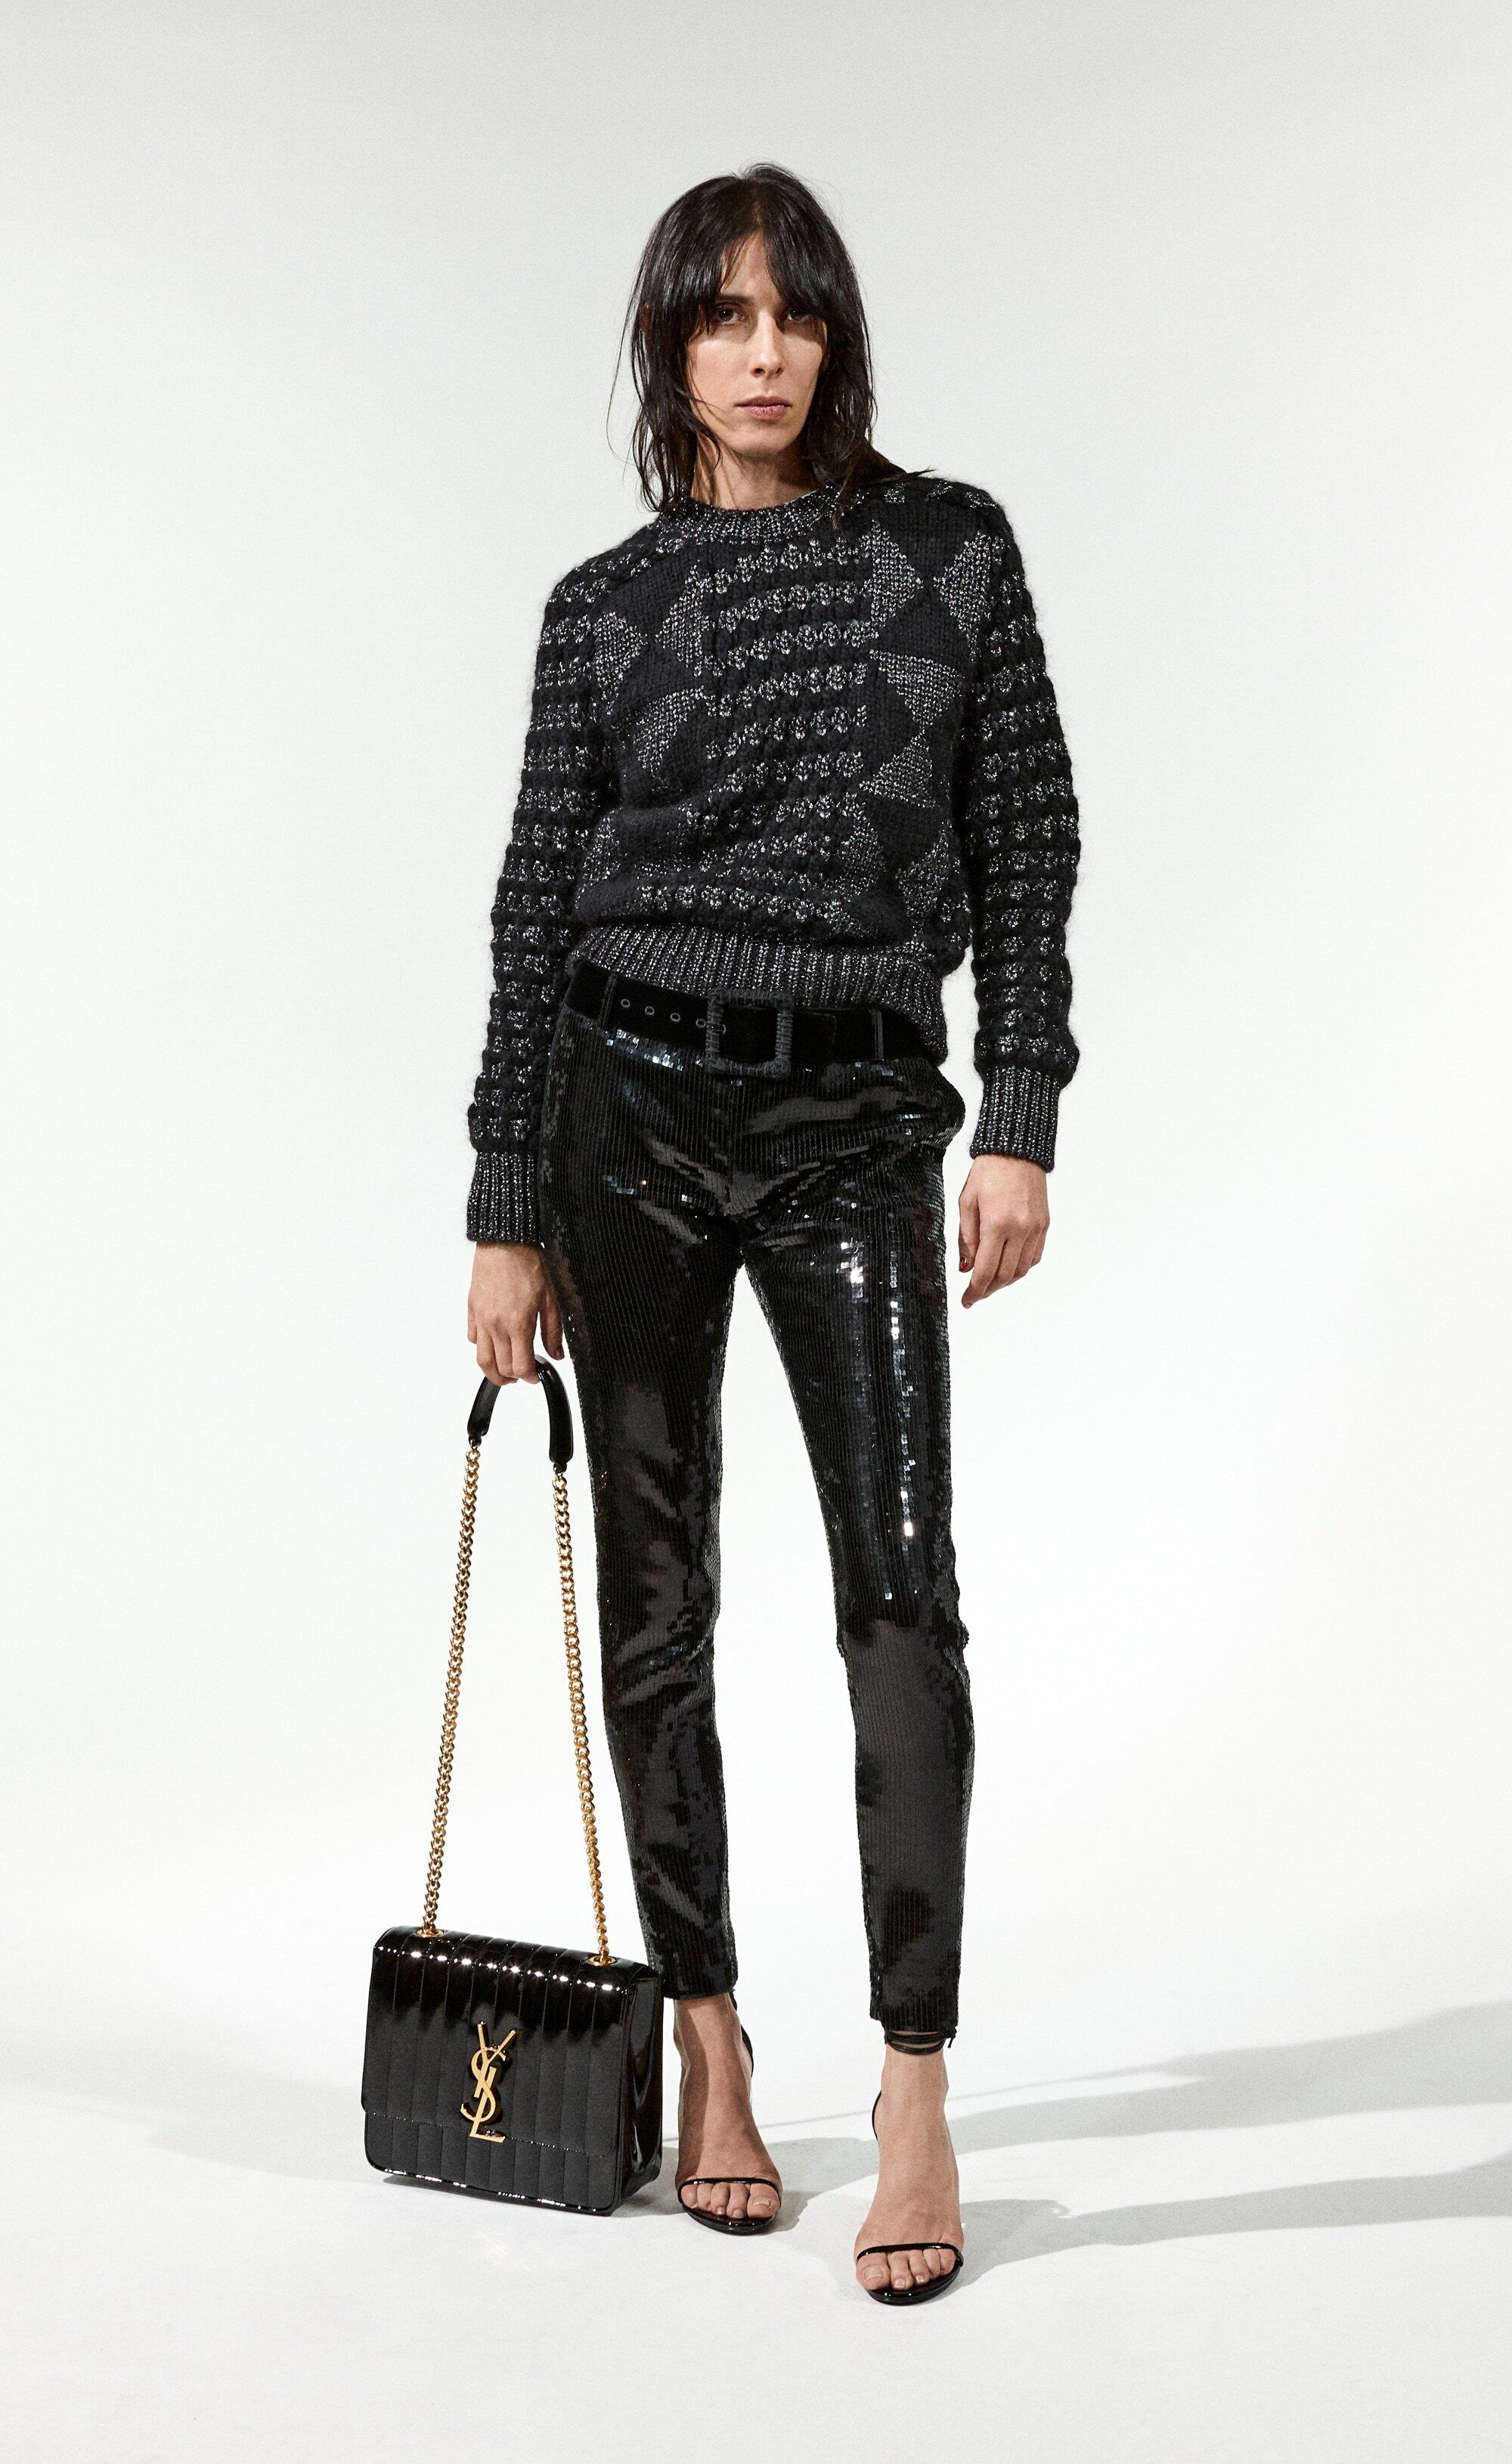 Syl Vicky Bag Y Yves Saint Laurent Ysl Bags St Laureant